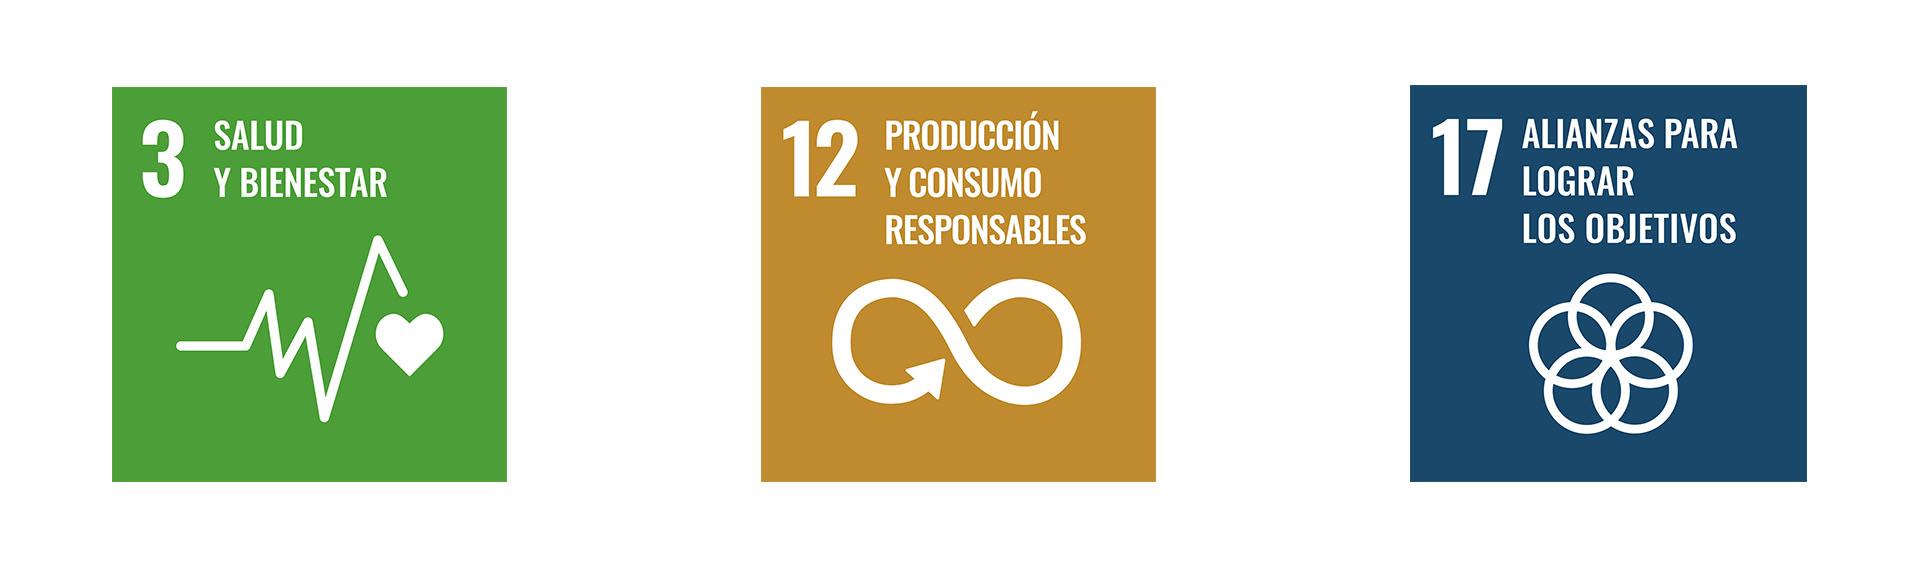 papel-rsc-objetivos-desarrollo-sostenible-ods